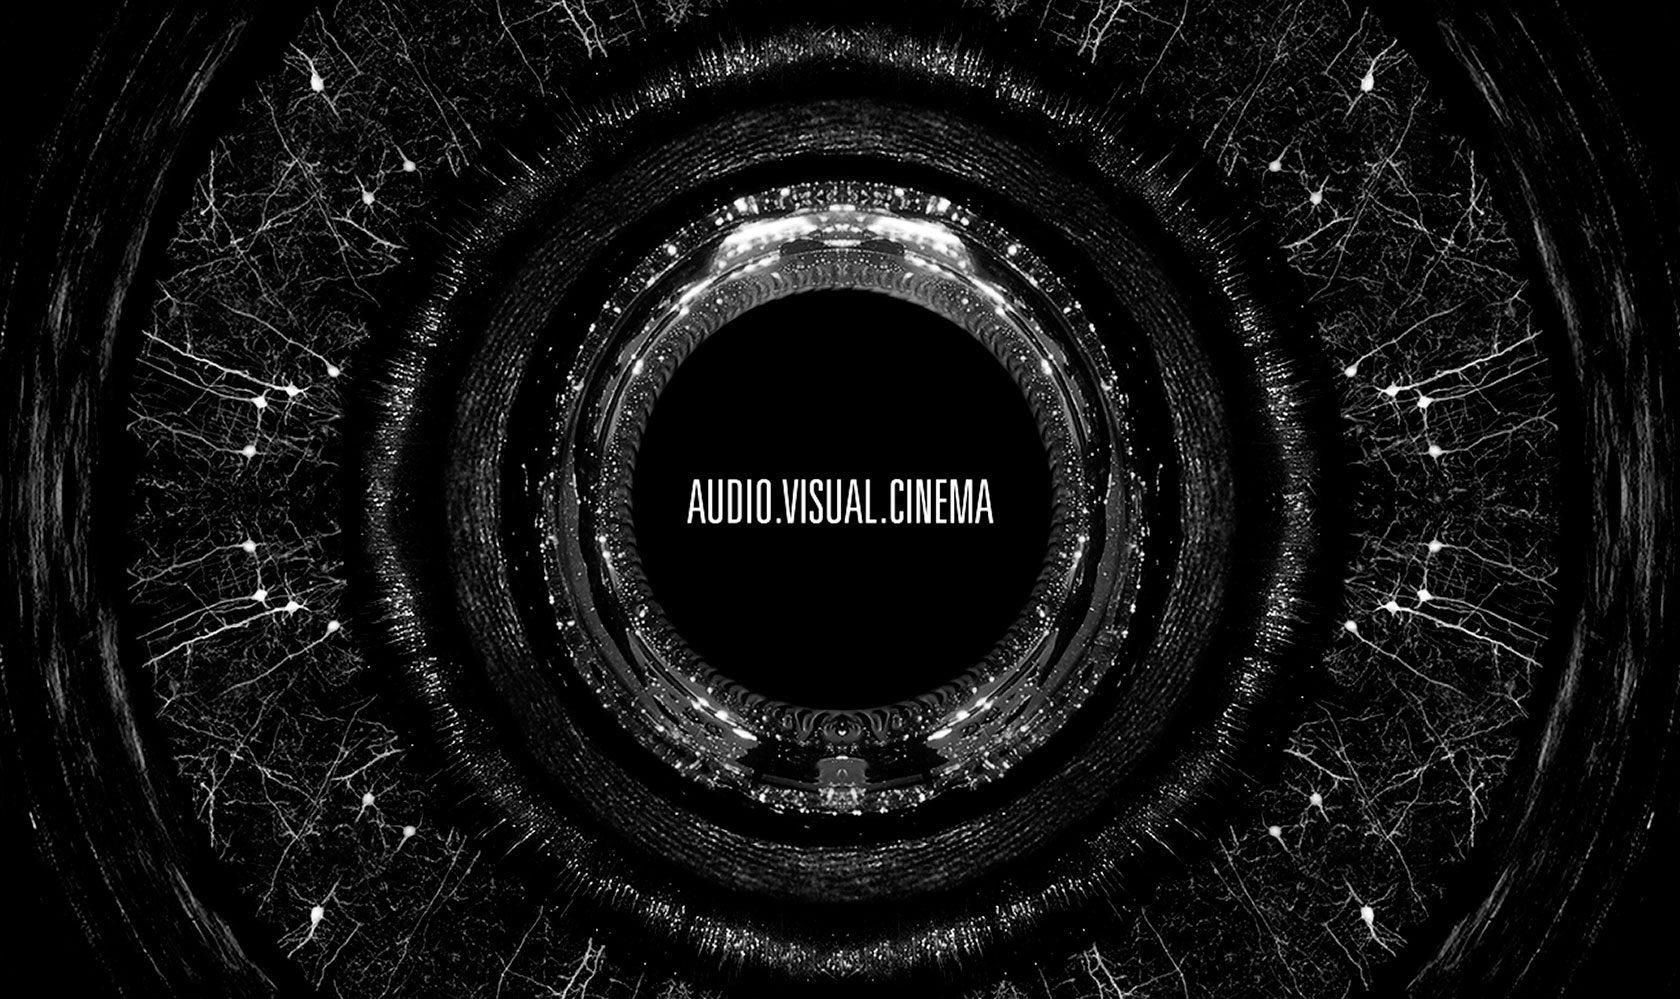 The Visual Medium Media Poster Design by Furia